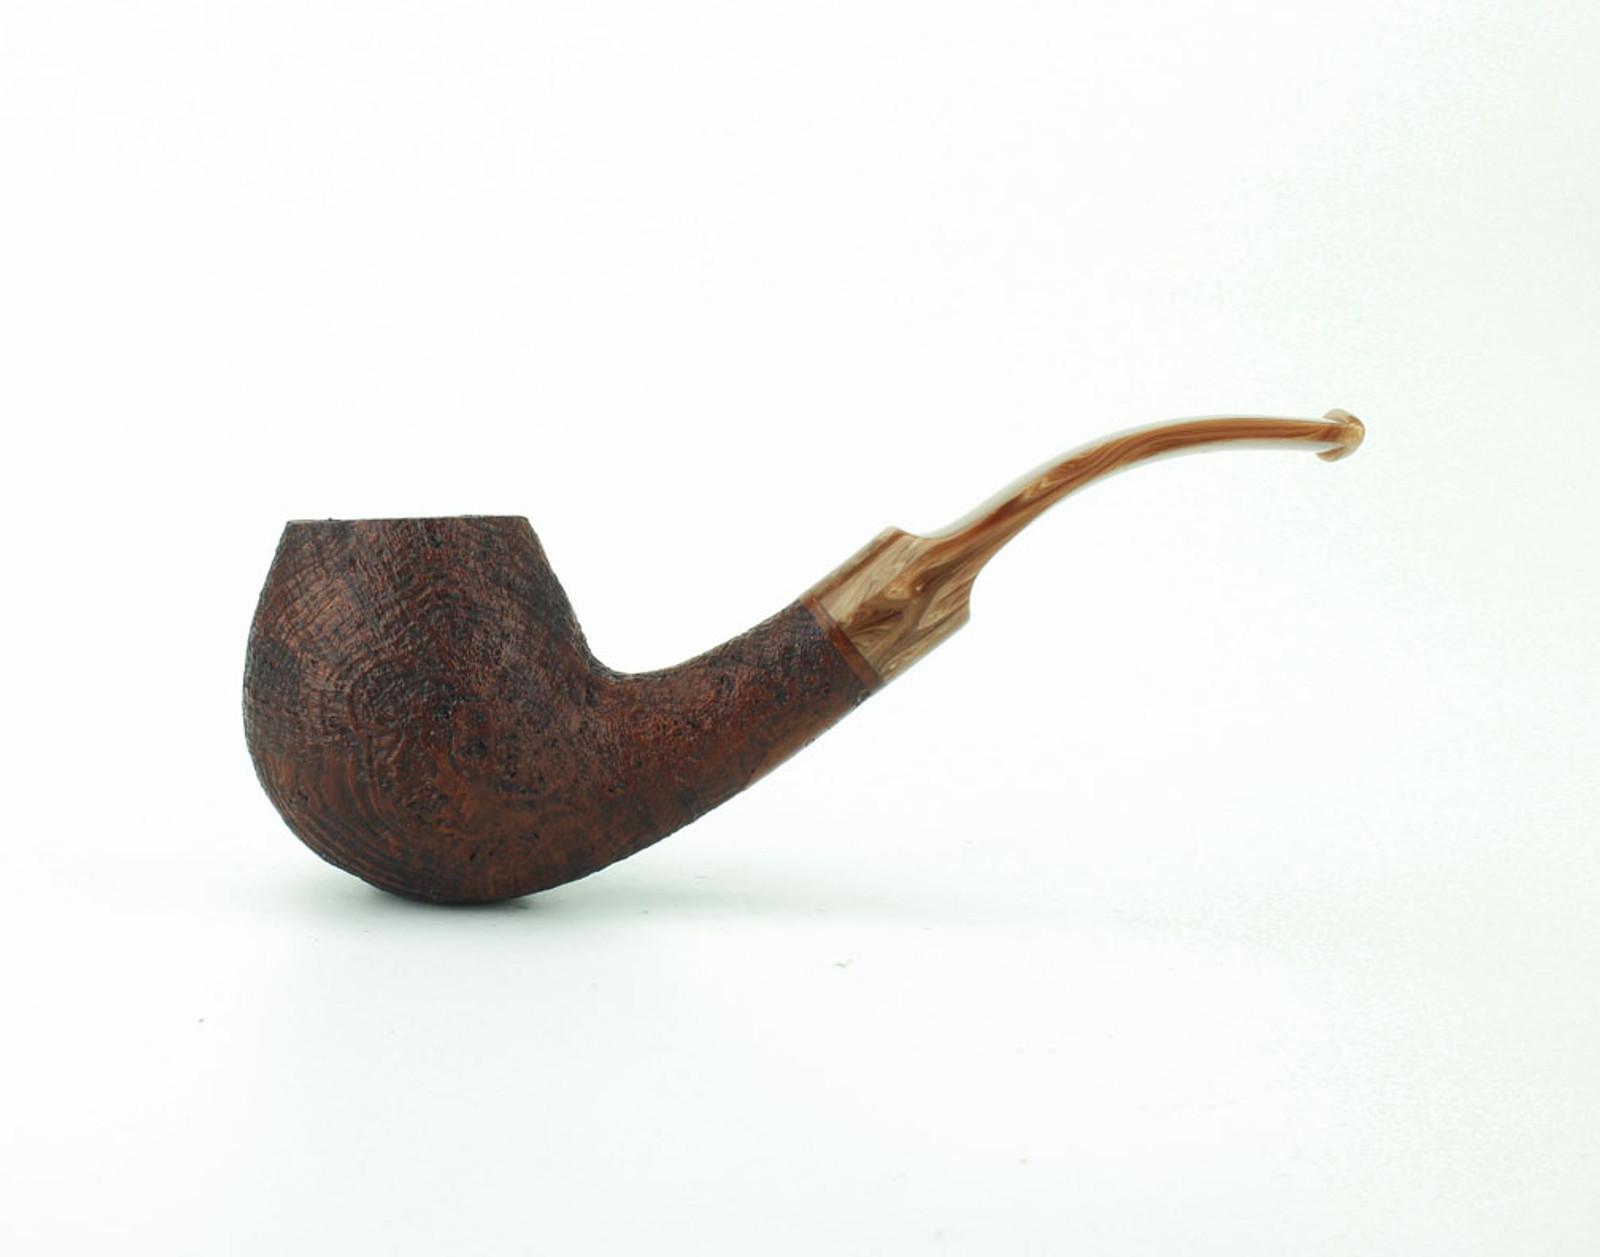 C91BB C - BriarWorks Classic C91 Bent Apple - Brown Blast w/ Coffee Stem